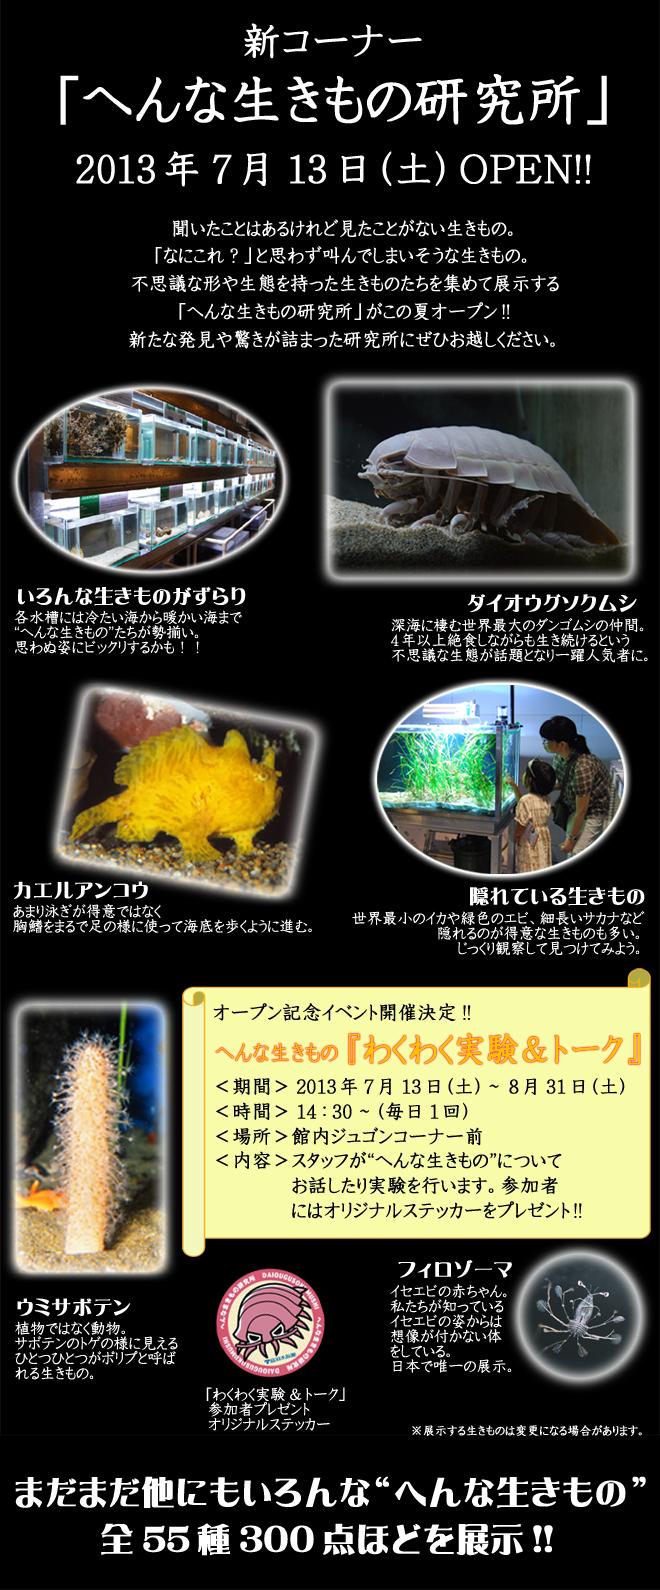 info_head_image_1373709049.jpg